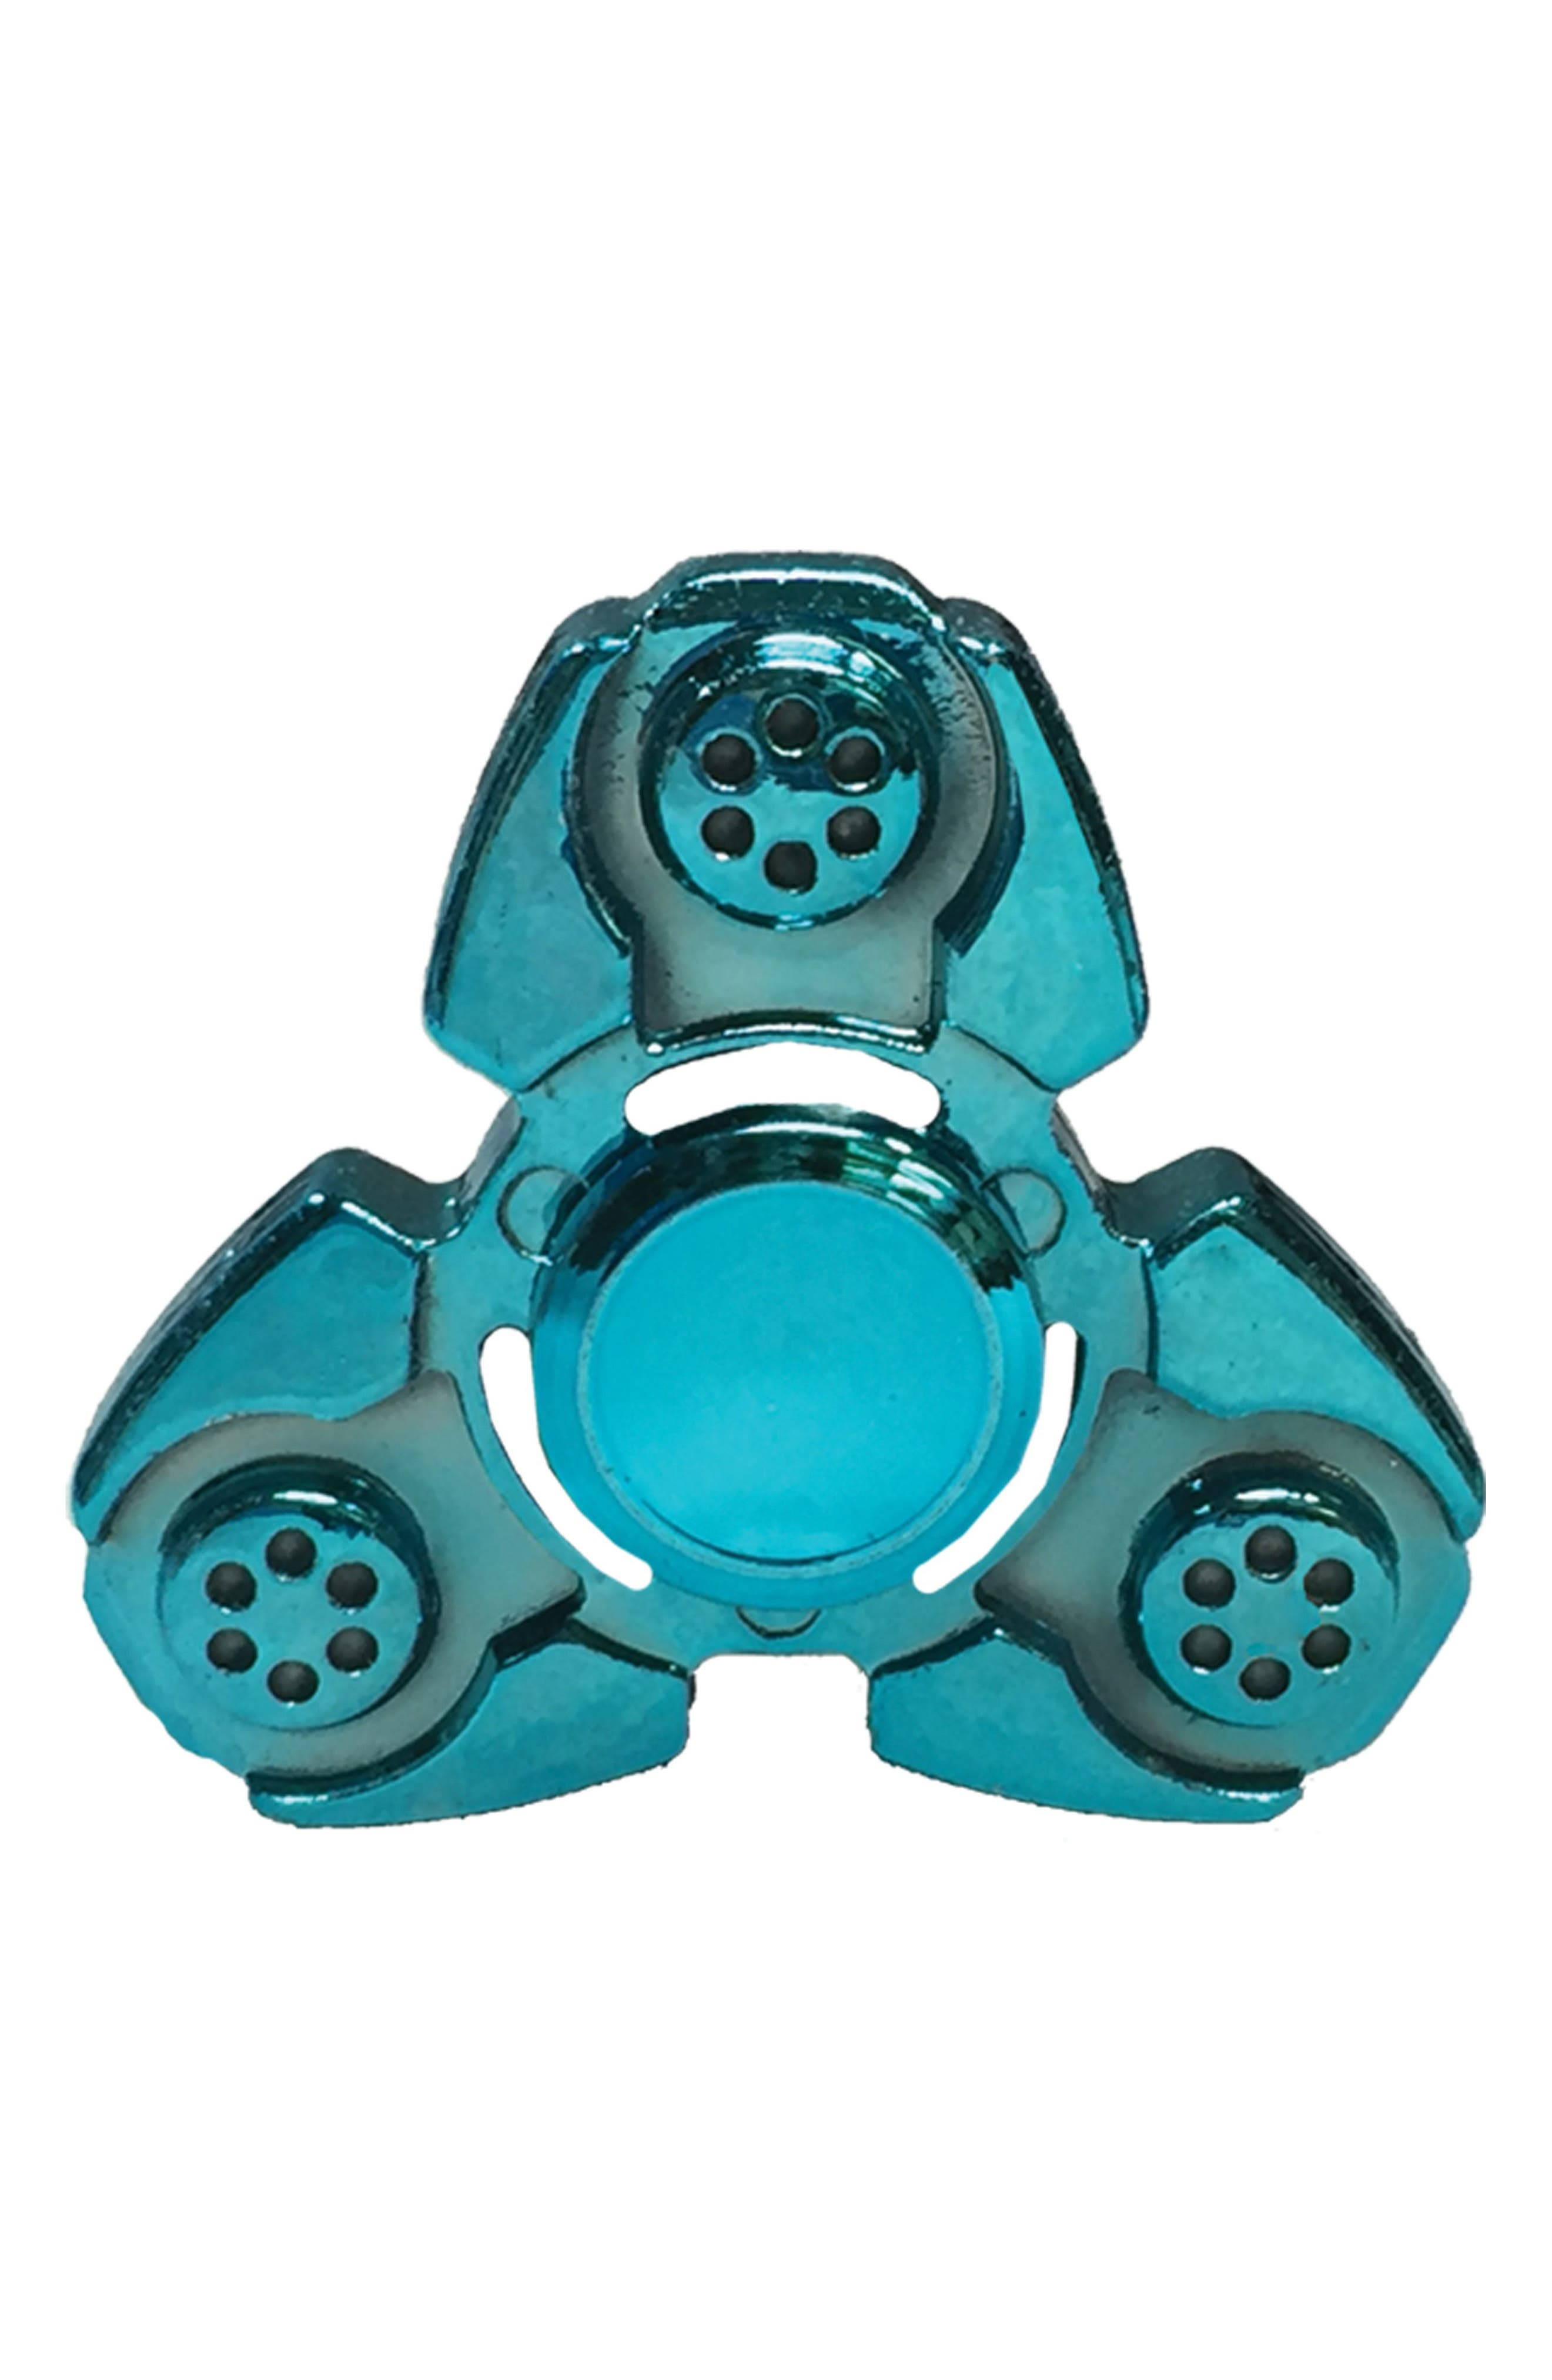 Main Image - Jeannie's Enterprises Final Frontier Fidget Spinner